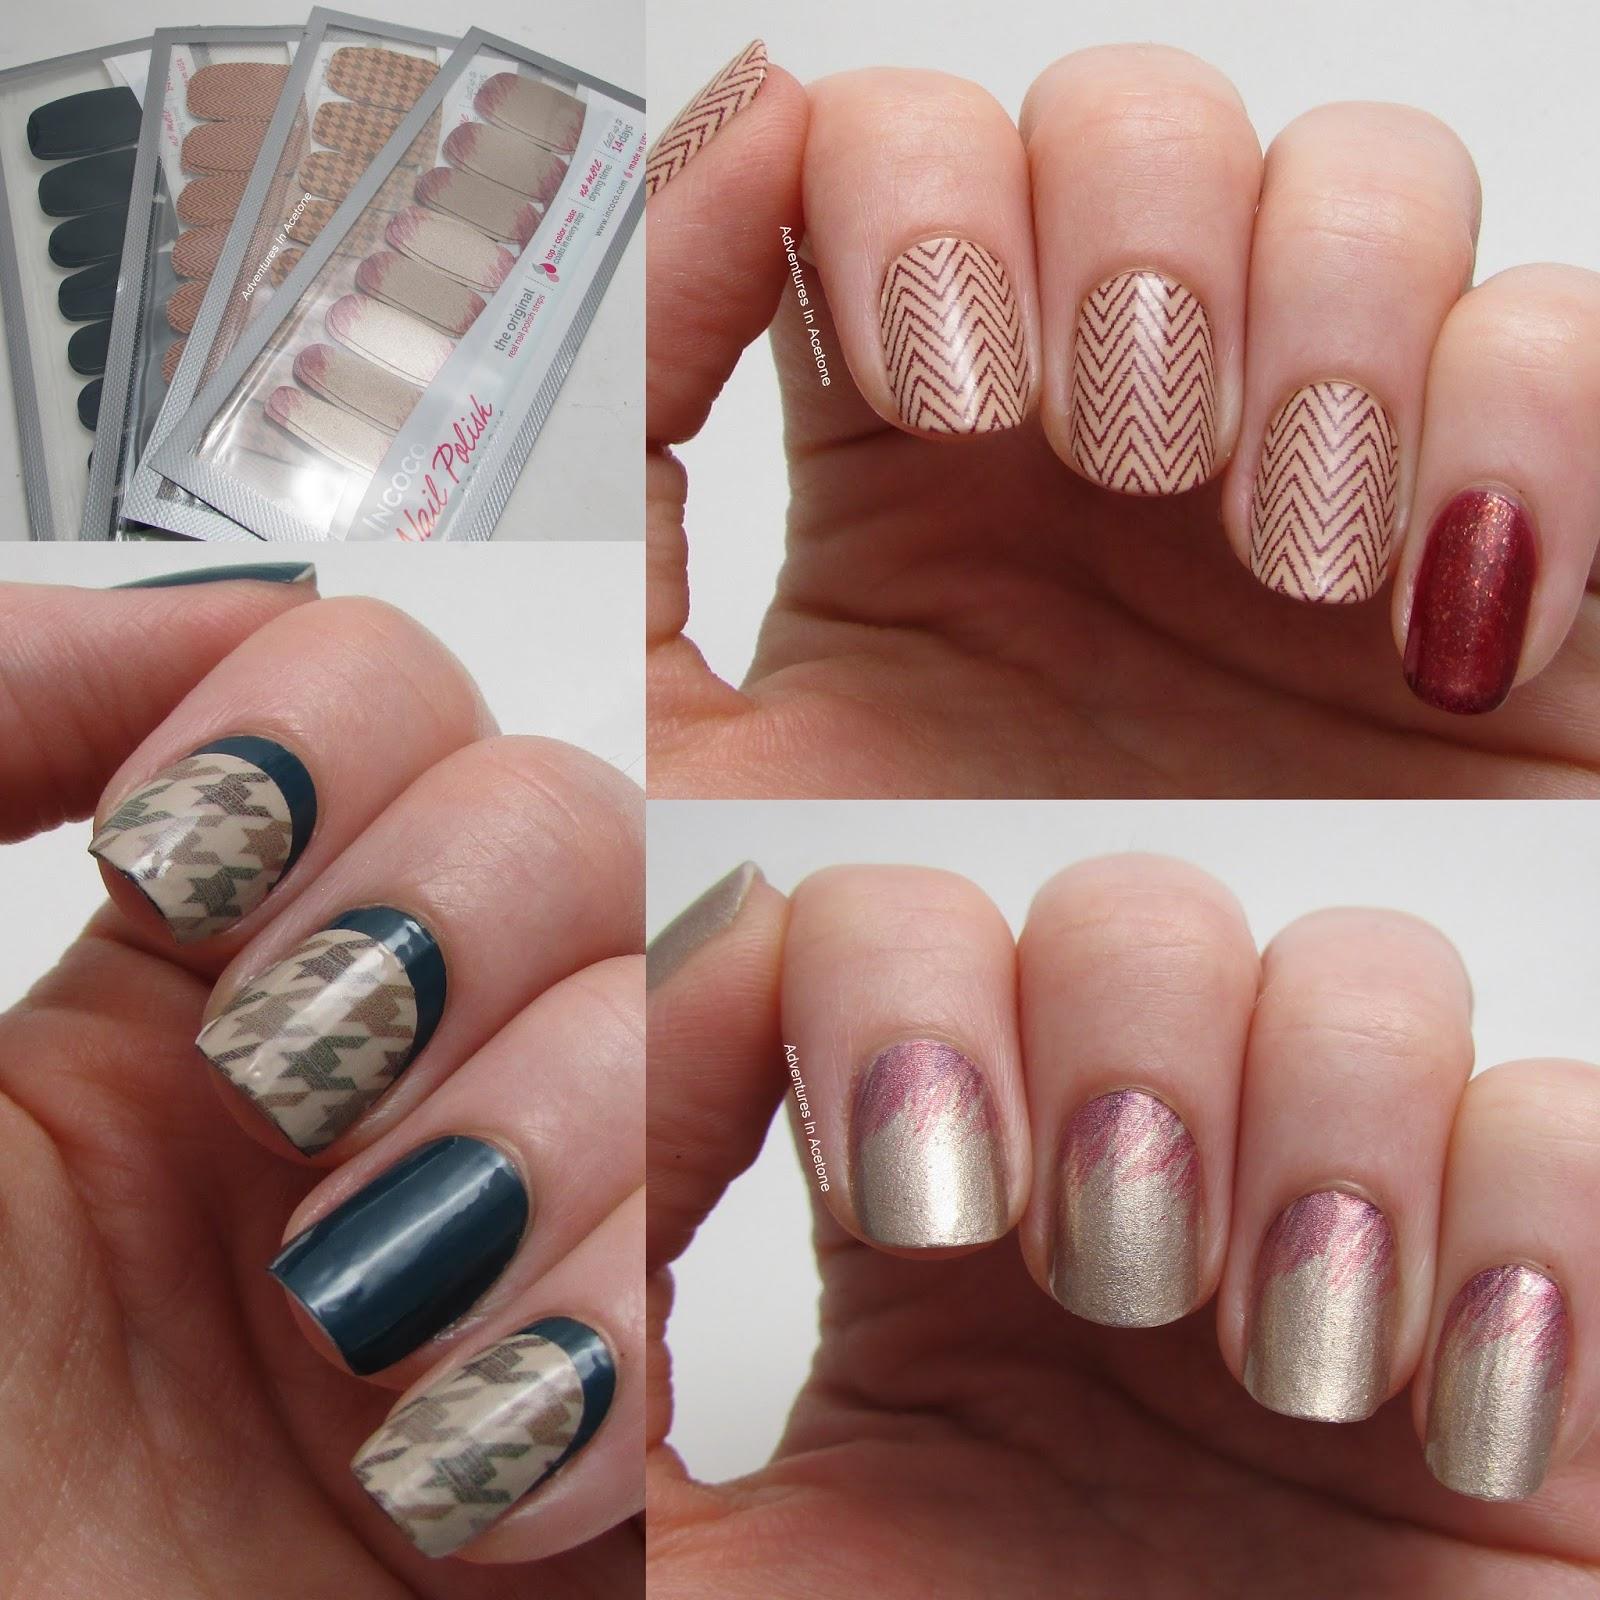 Most Popular Nail Design